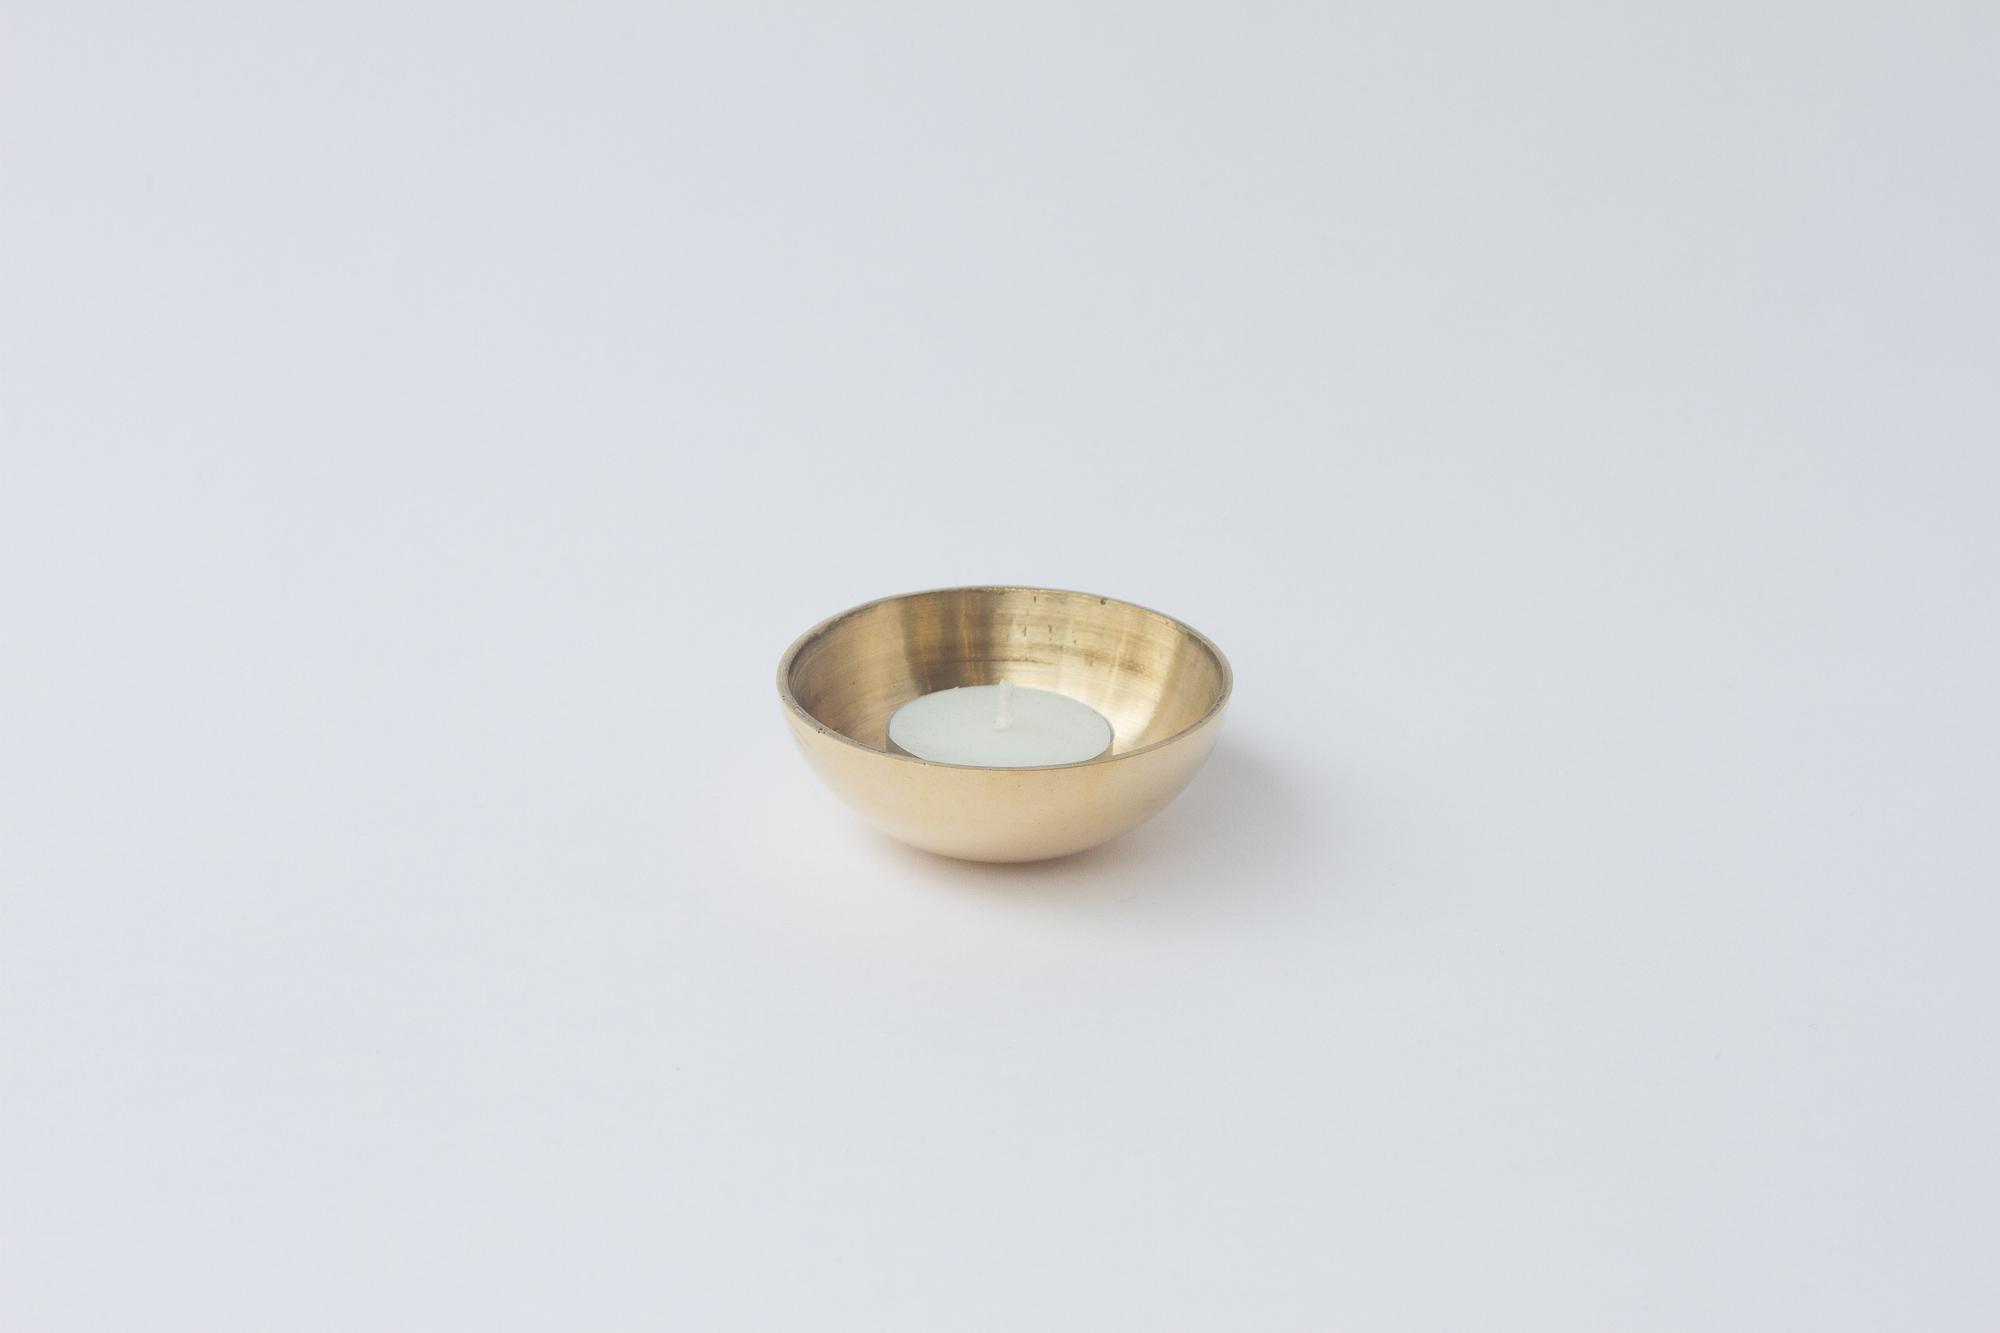 brass small candle tea holder.jpg